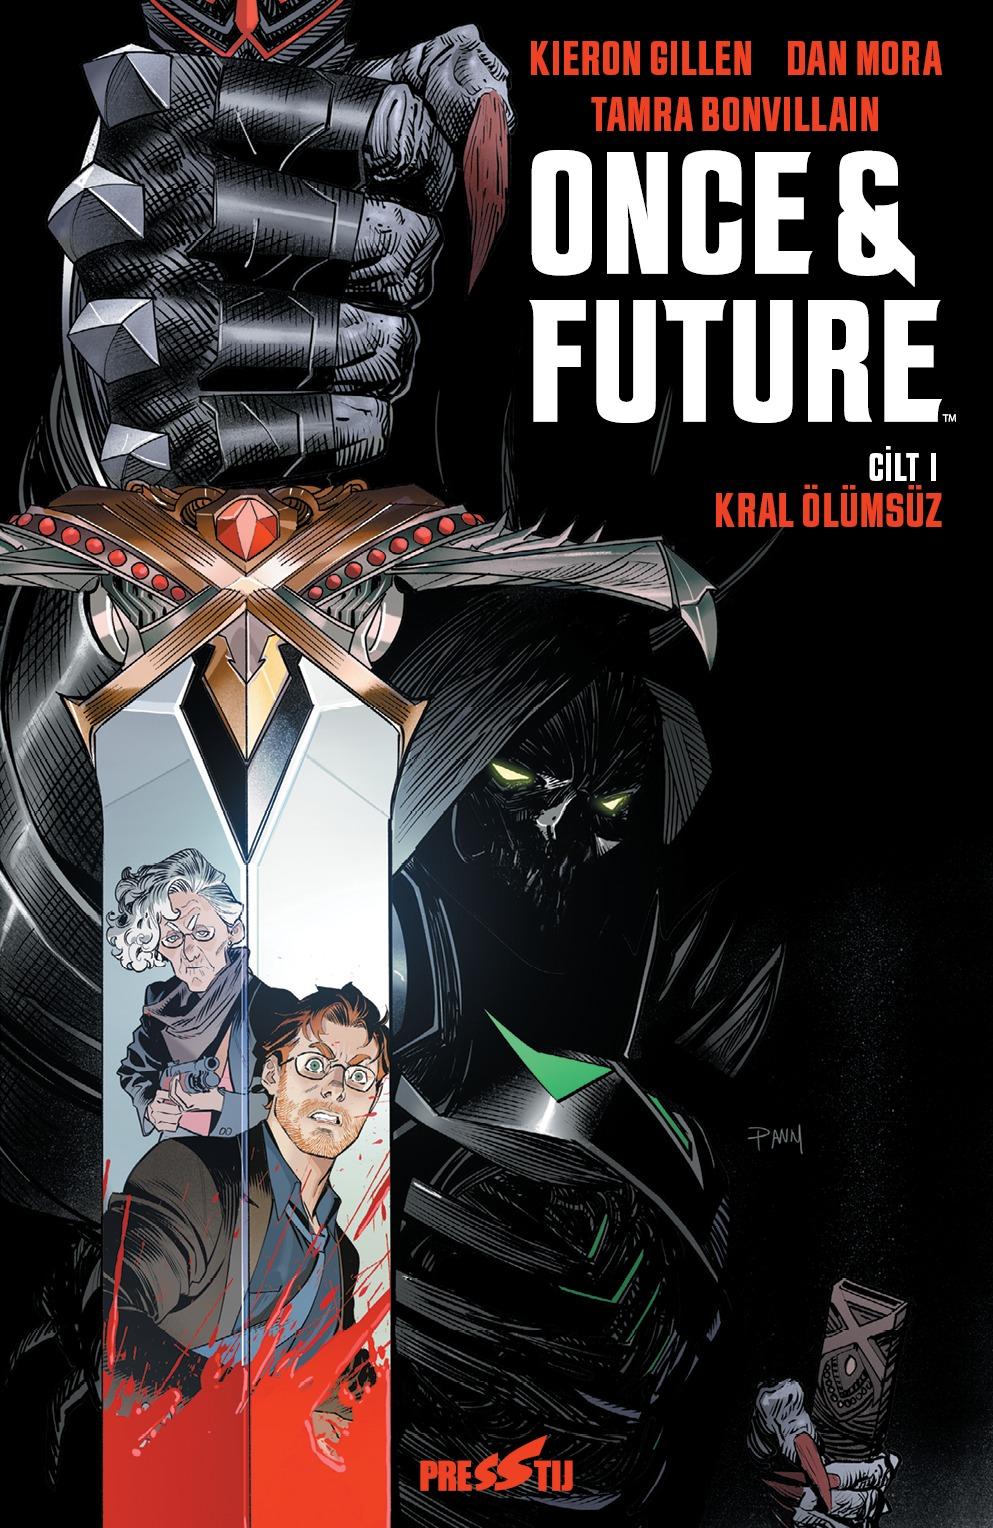 Once & Future Cilt 1 : Kral Ölümsüz